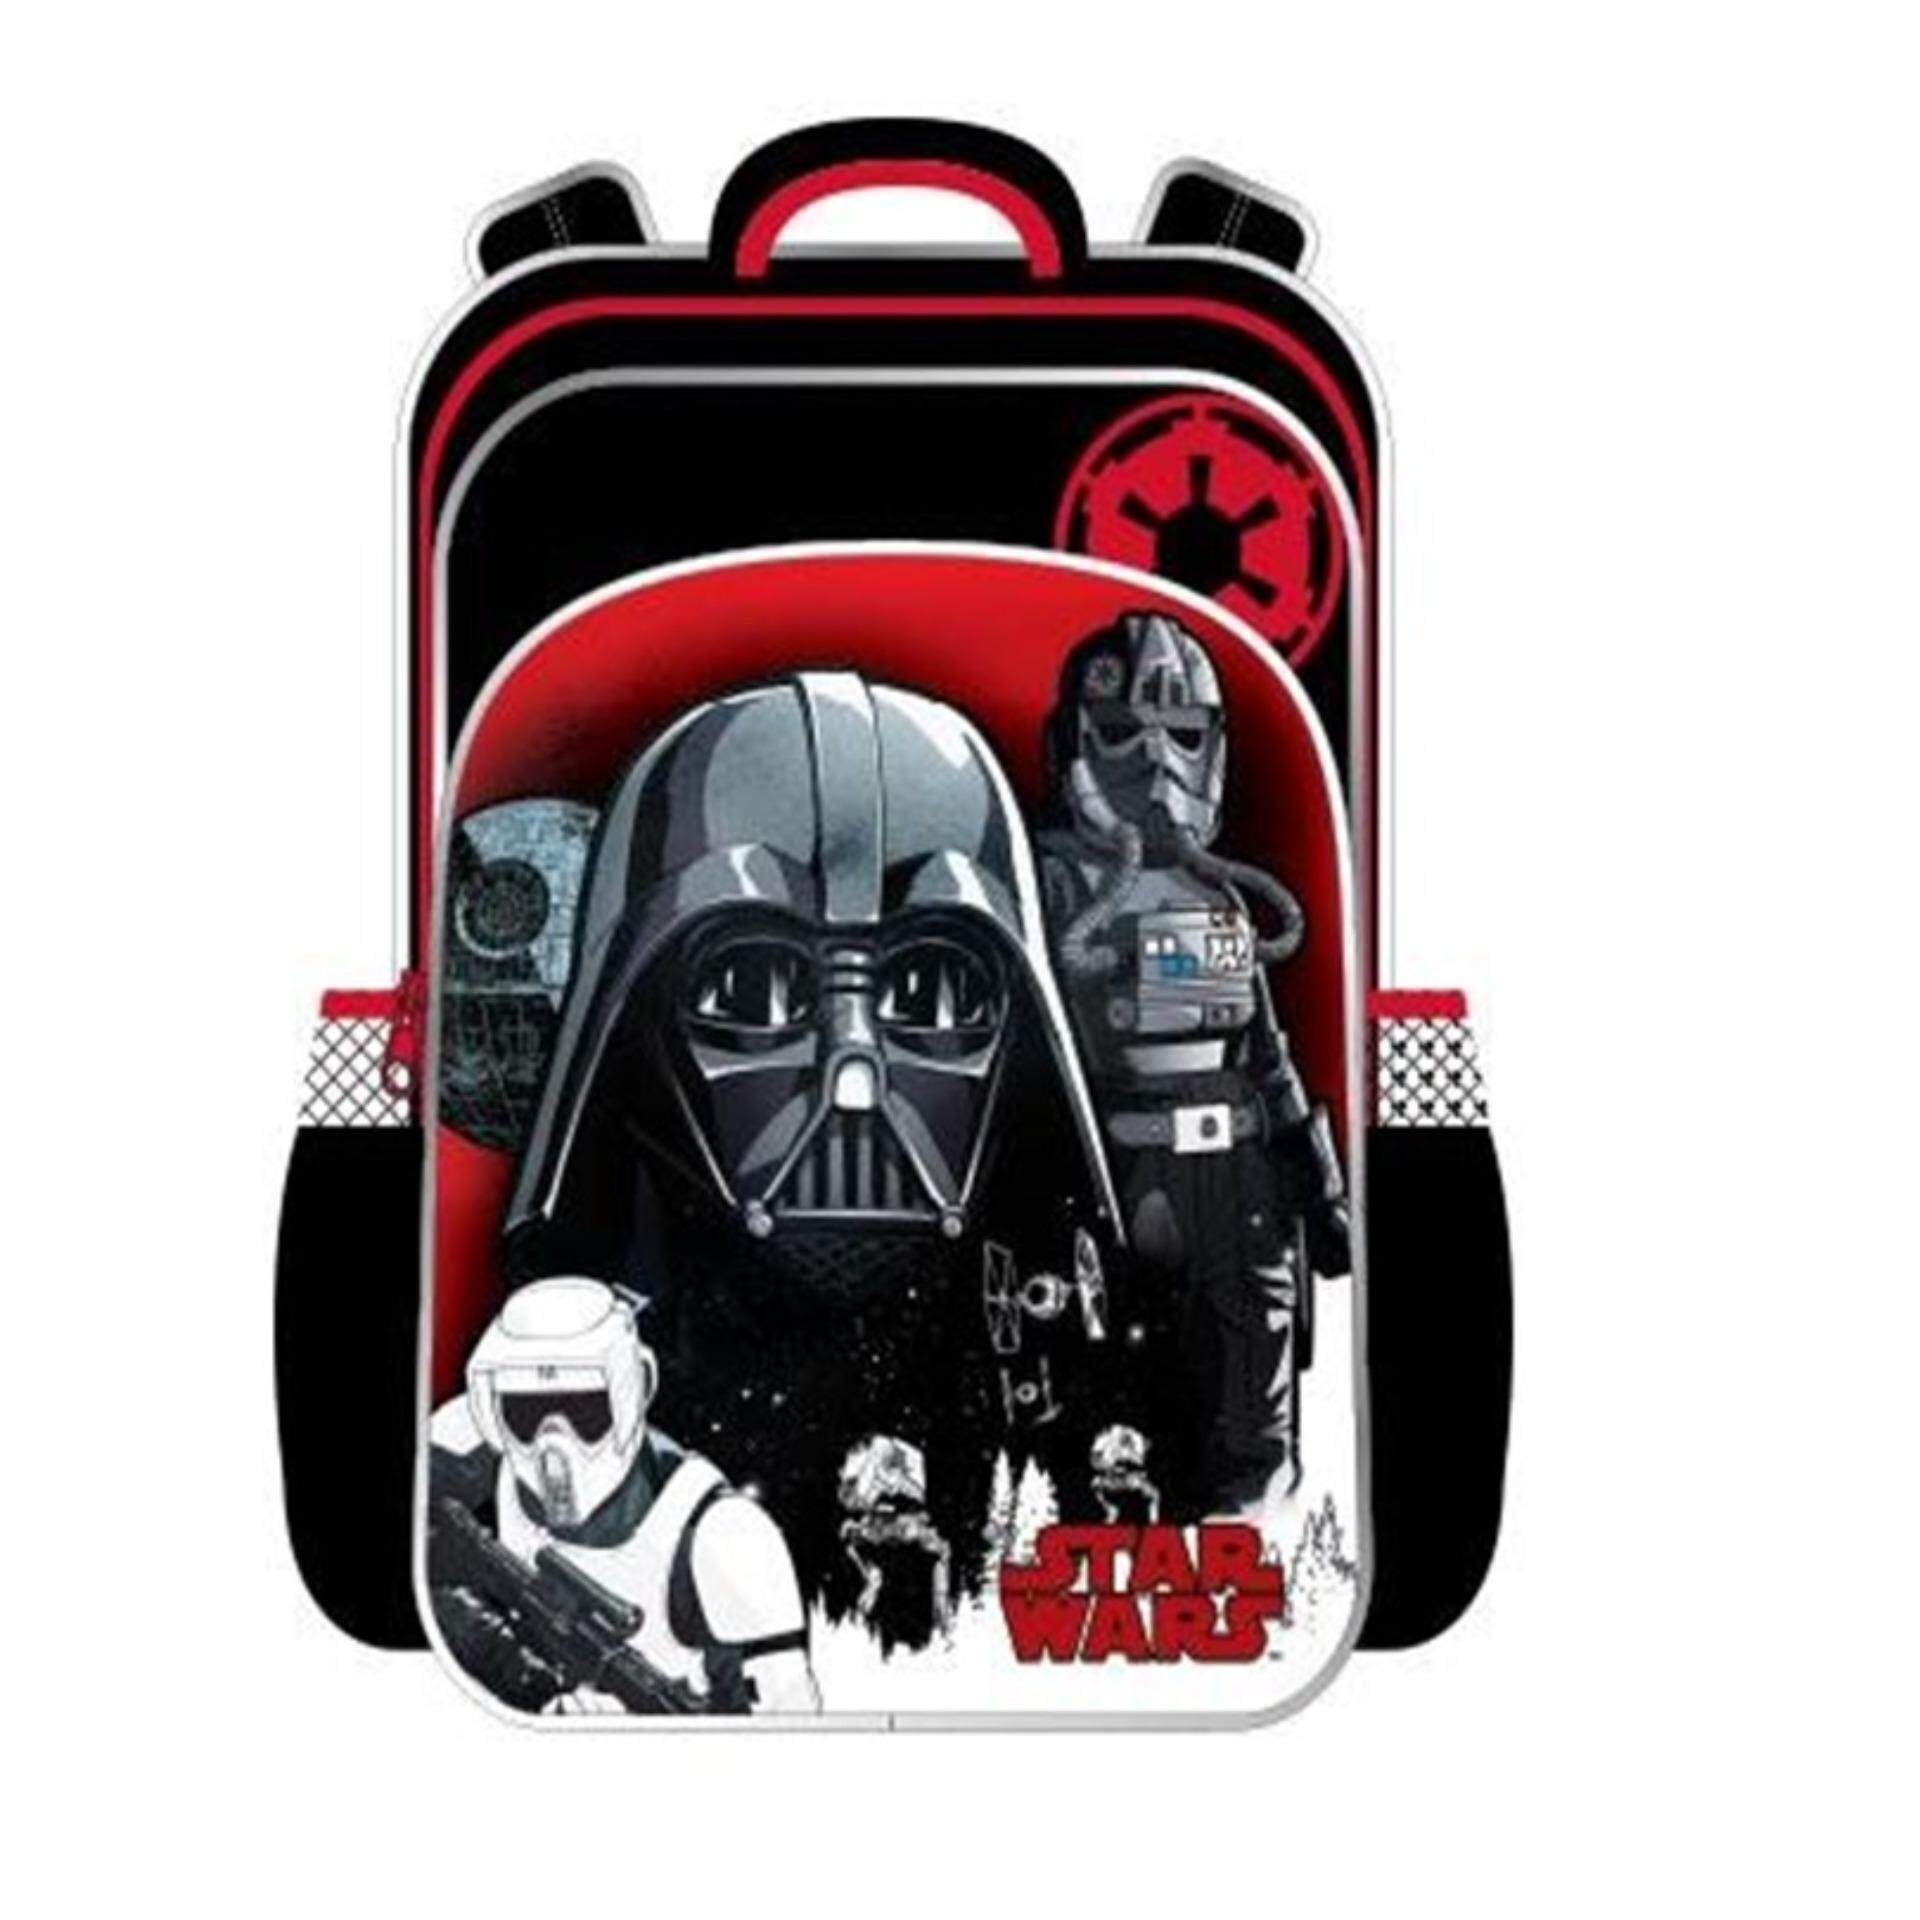 Disney Star Wars Primary School Bag Backpack - Darth Vader